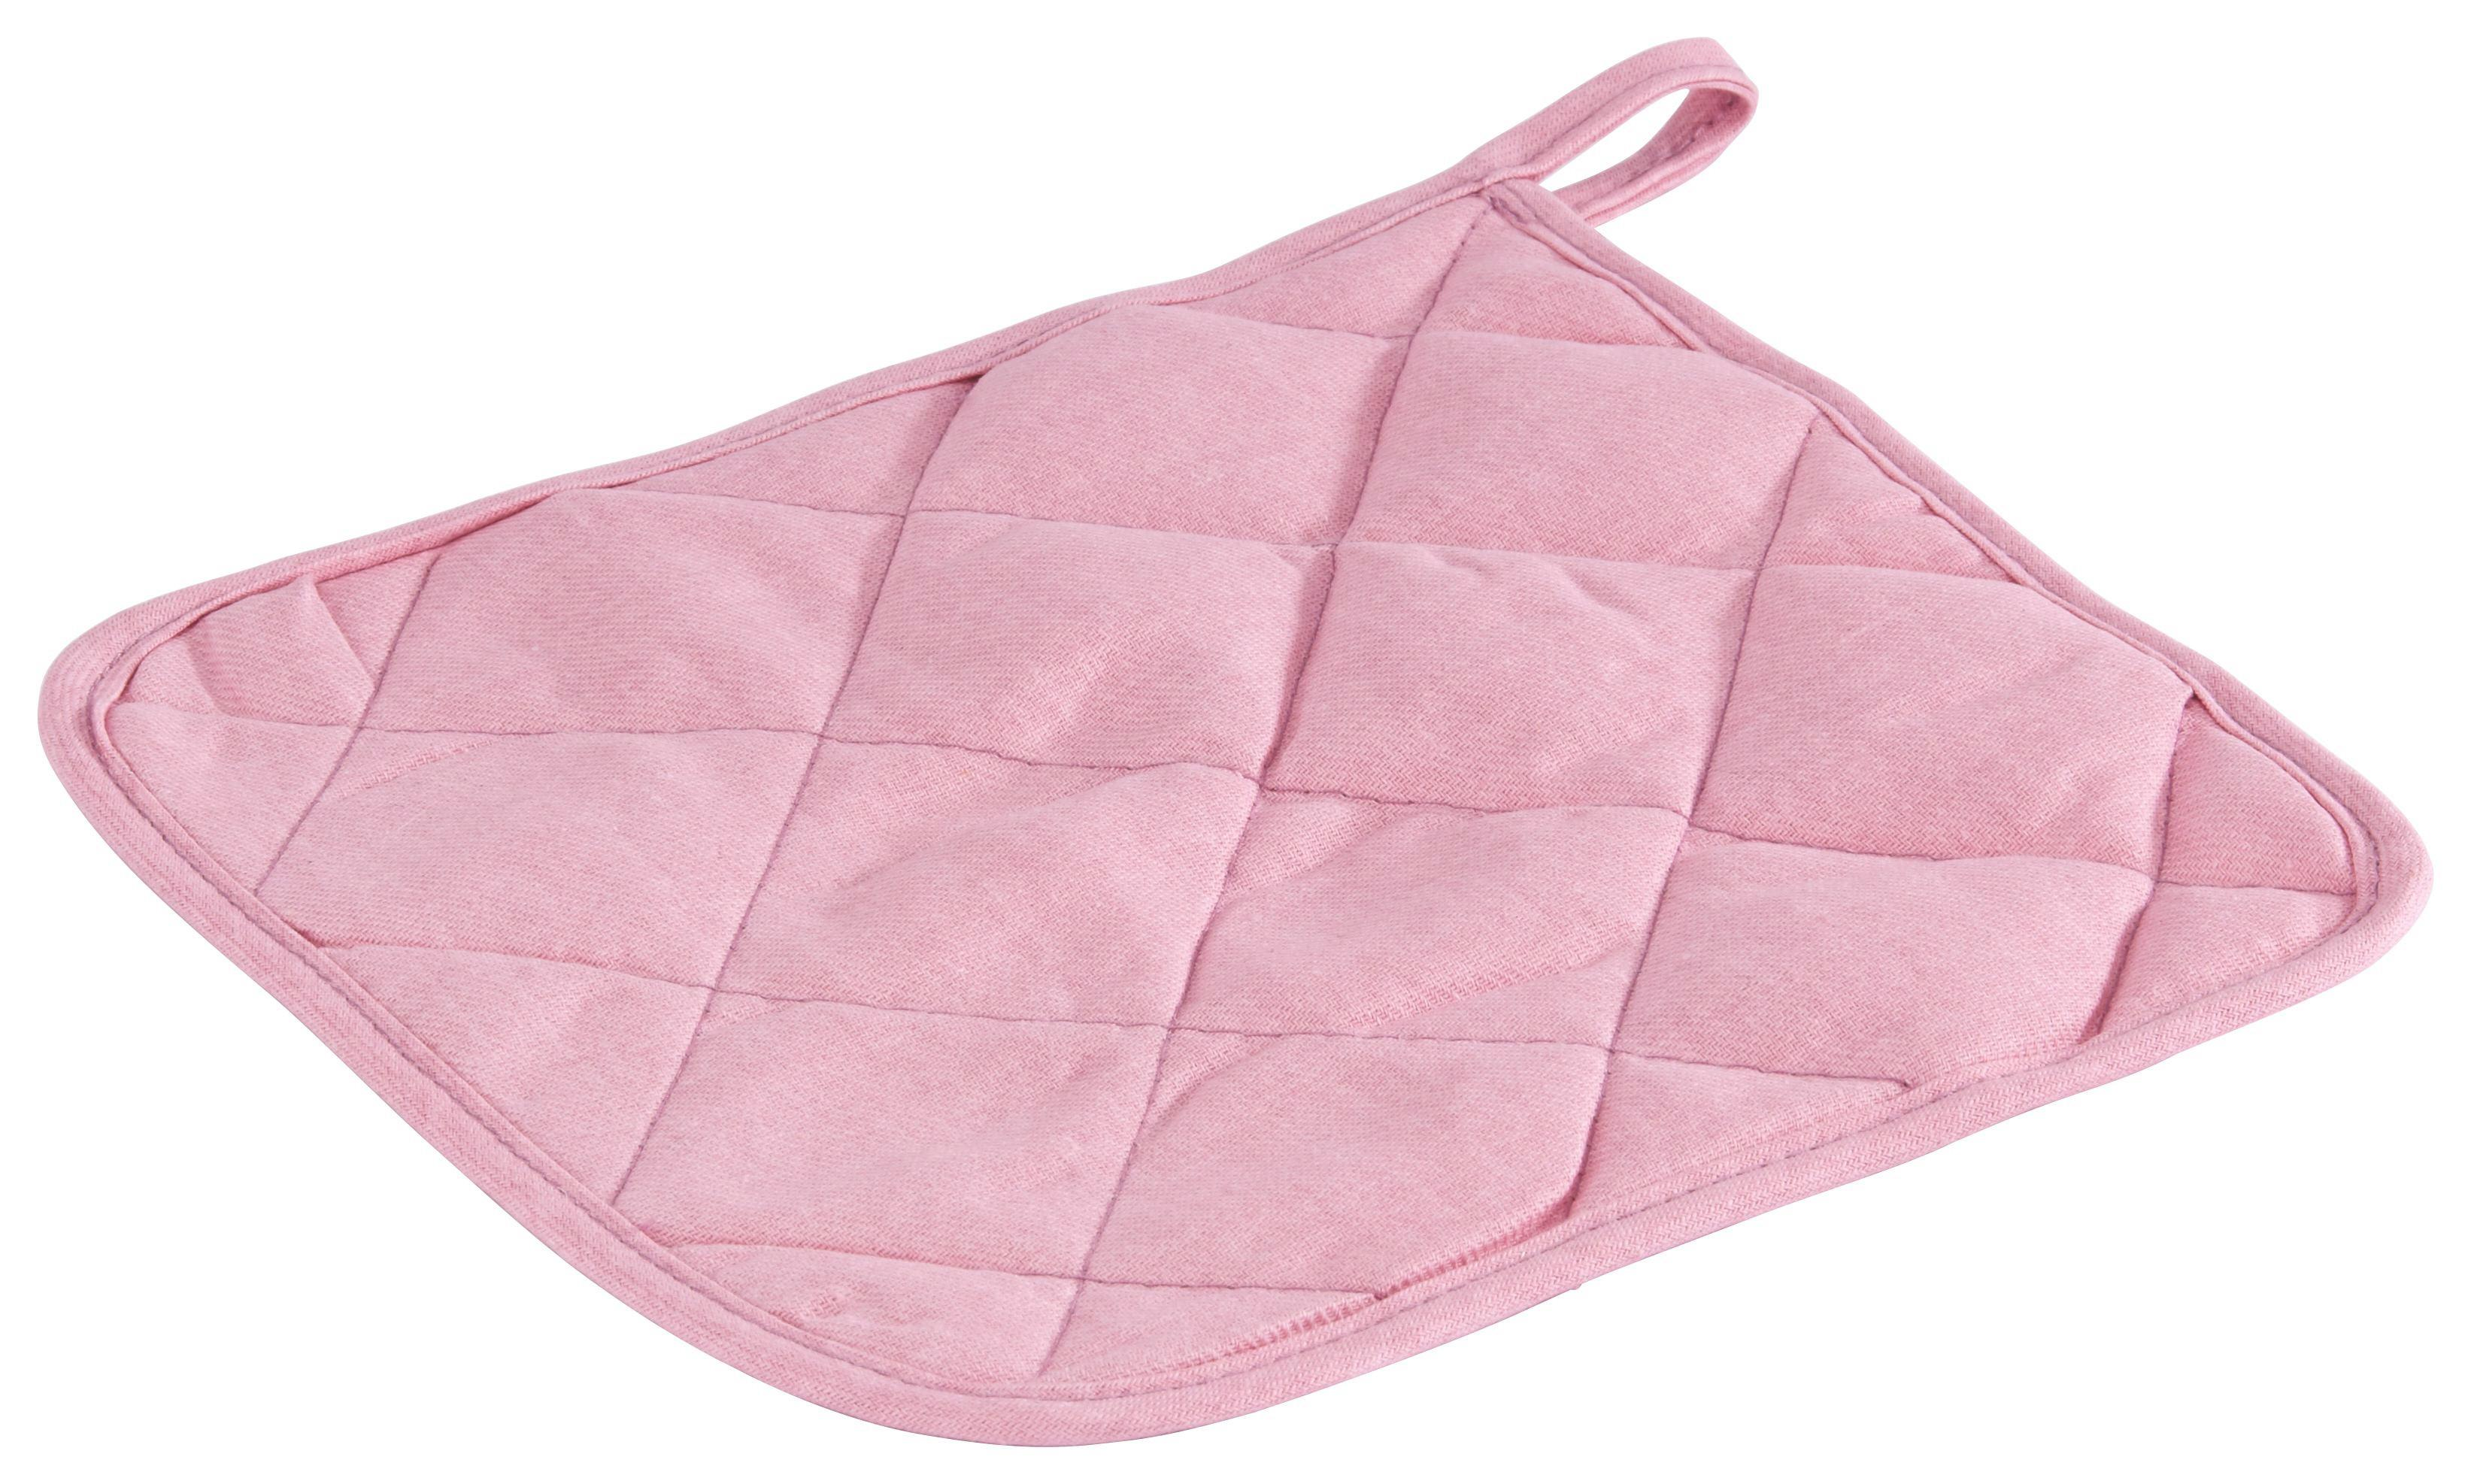 Topflappen Evelin in Rosa aus Baumwolle - Rosa, Textil (20/20cm) - MÖMAX modern living